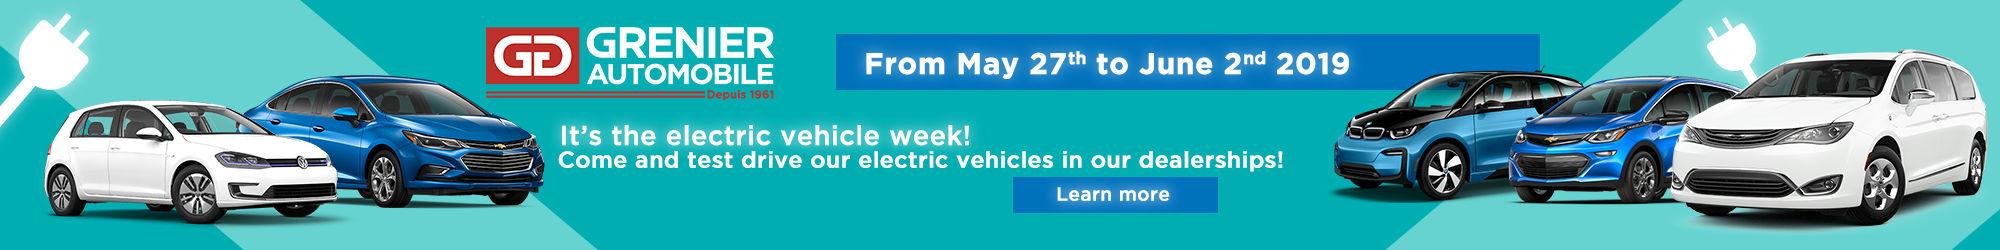 Grenier Automobile : Electric vehicle week! (Copy)